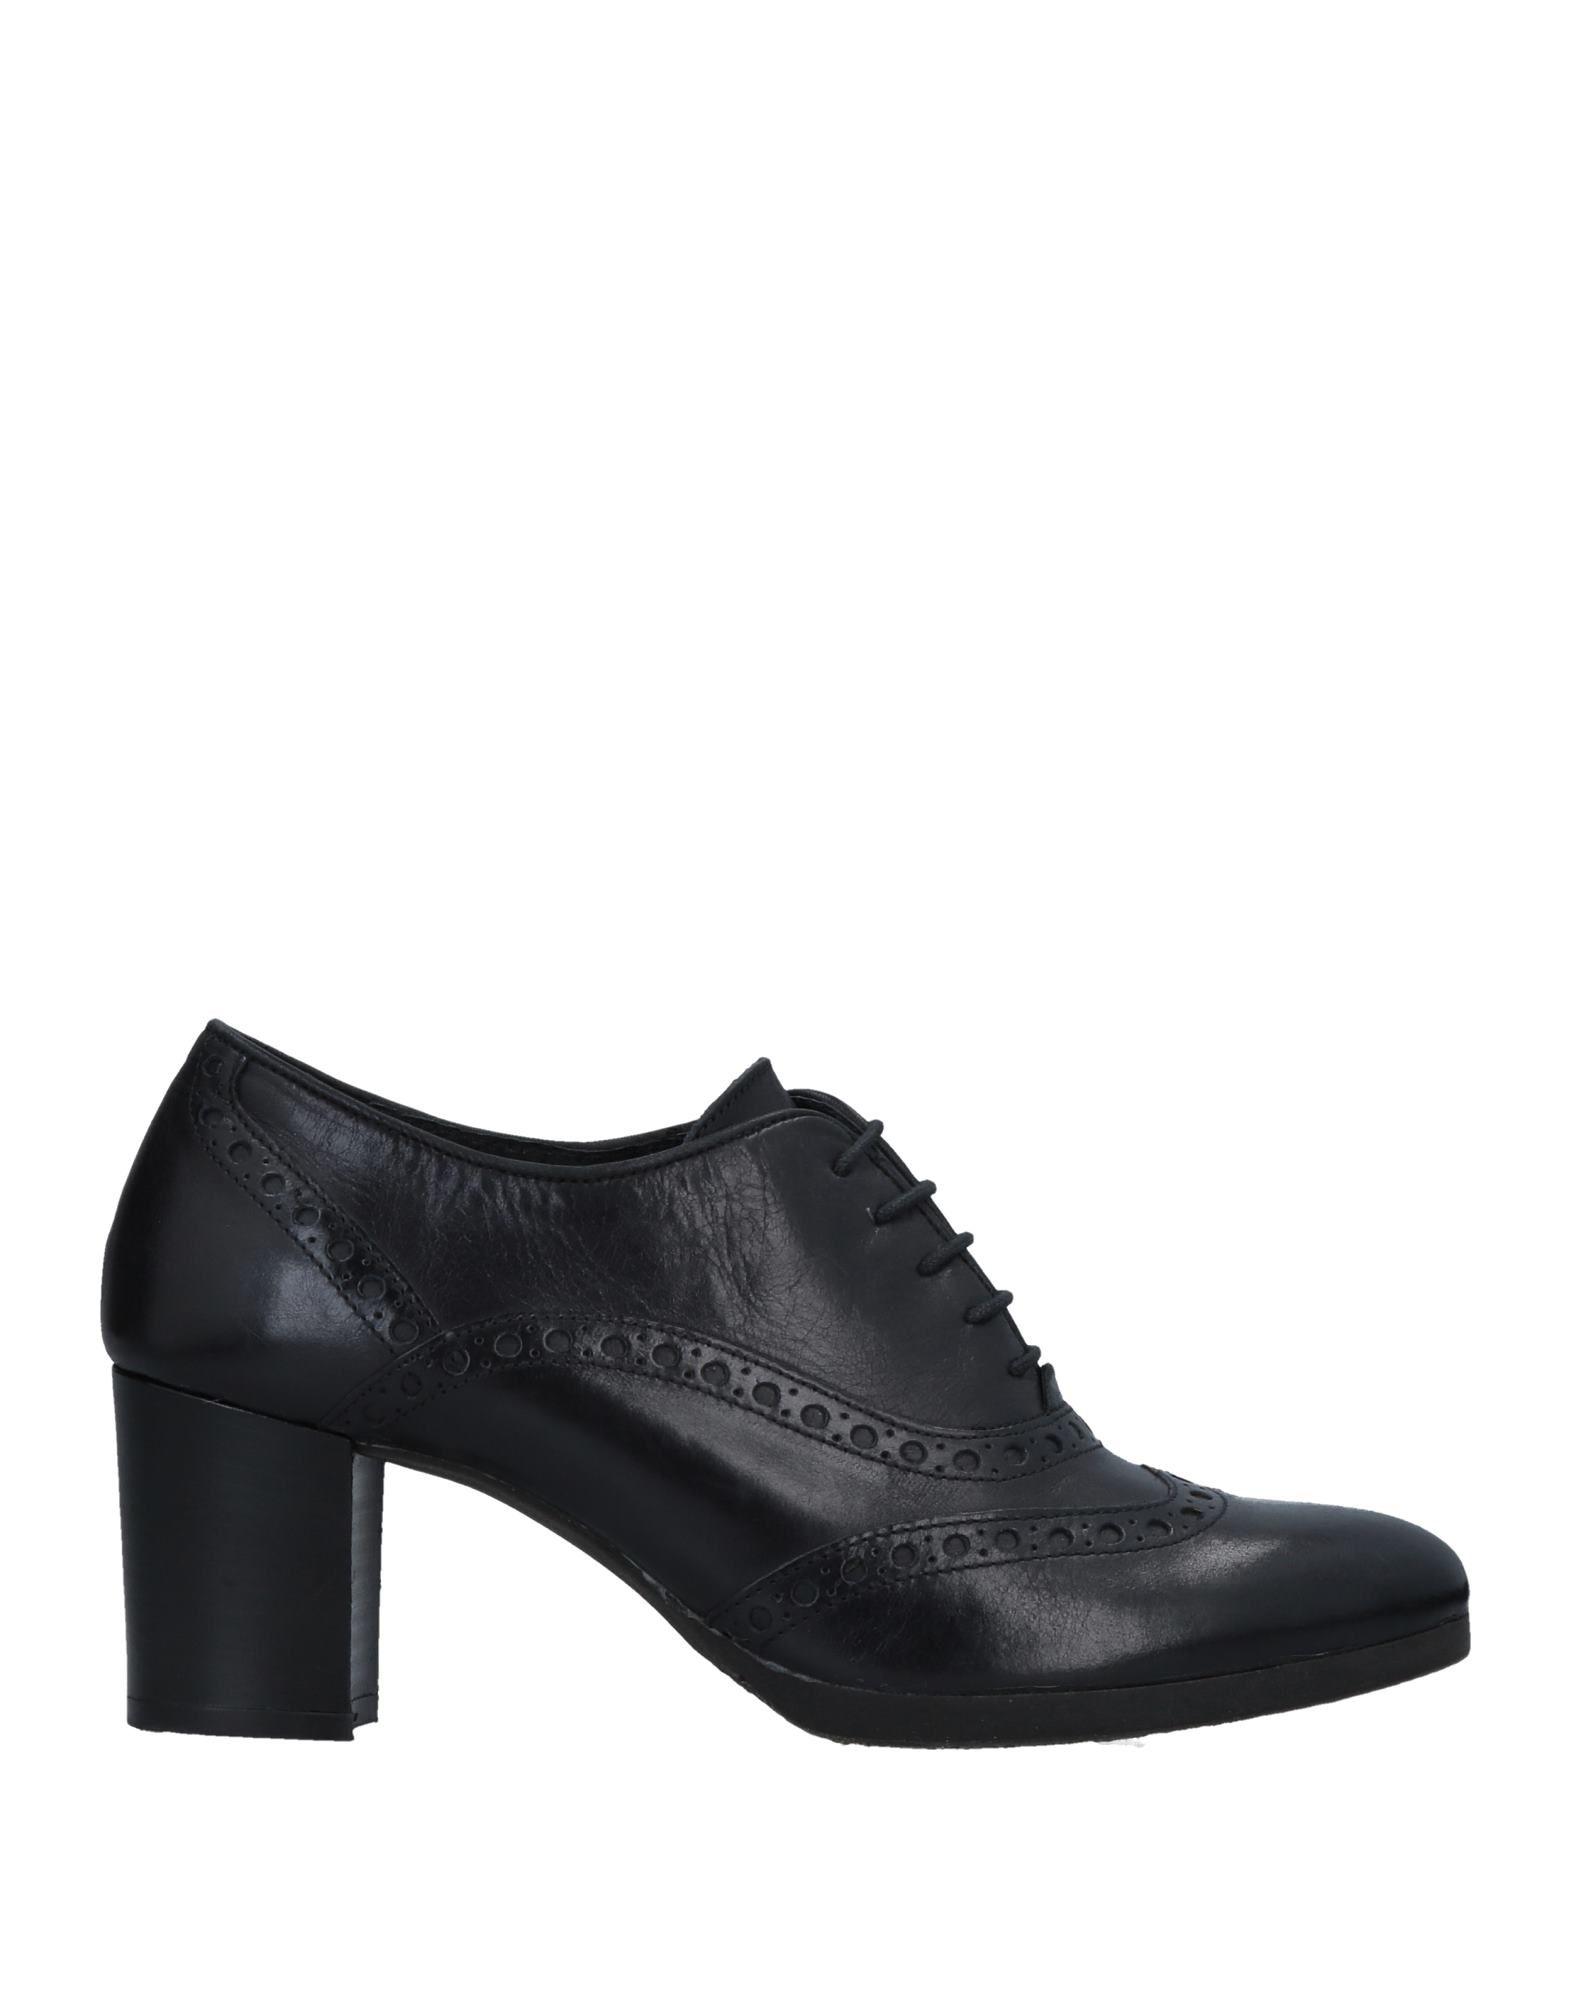 Soldini Schnürschuhe Damen  11505587LF Gute Qualität beliebte Schuhe